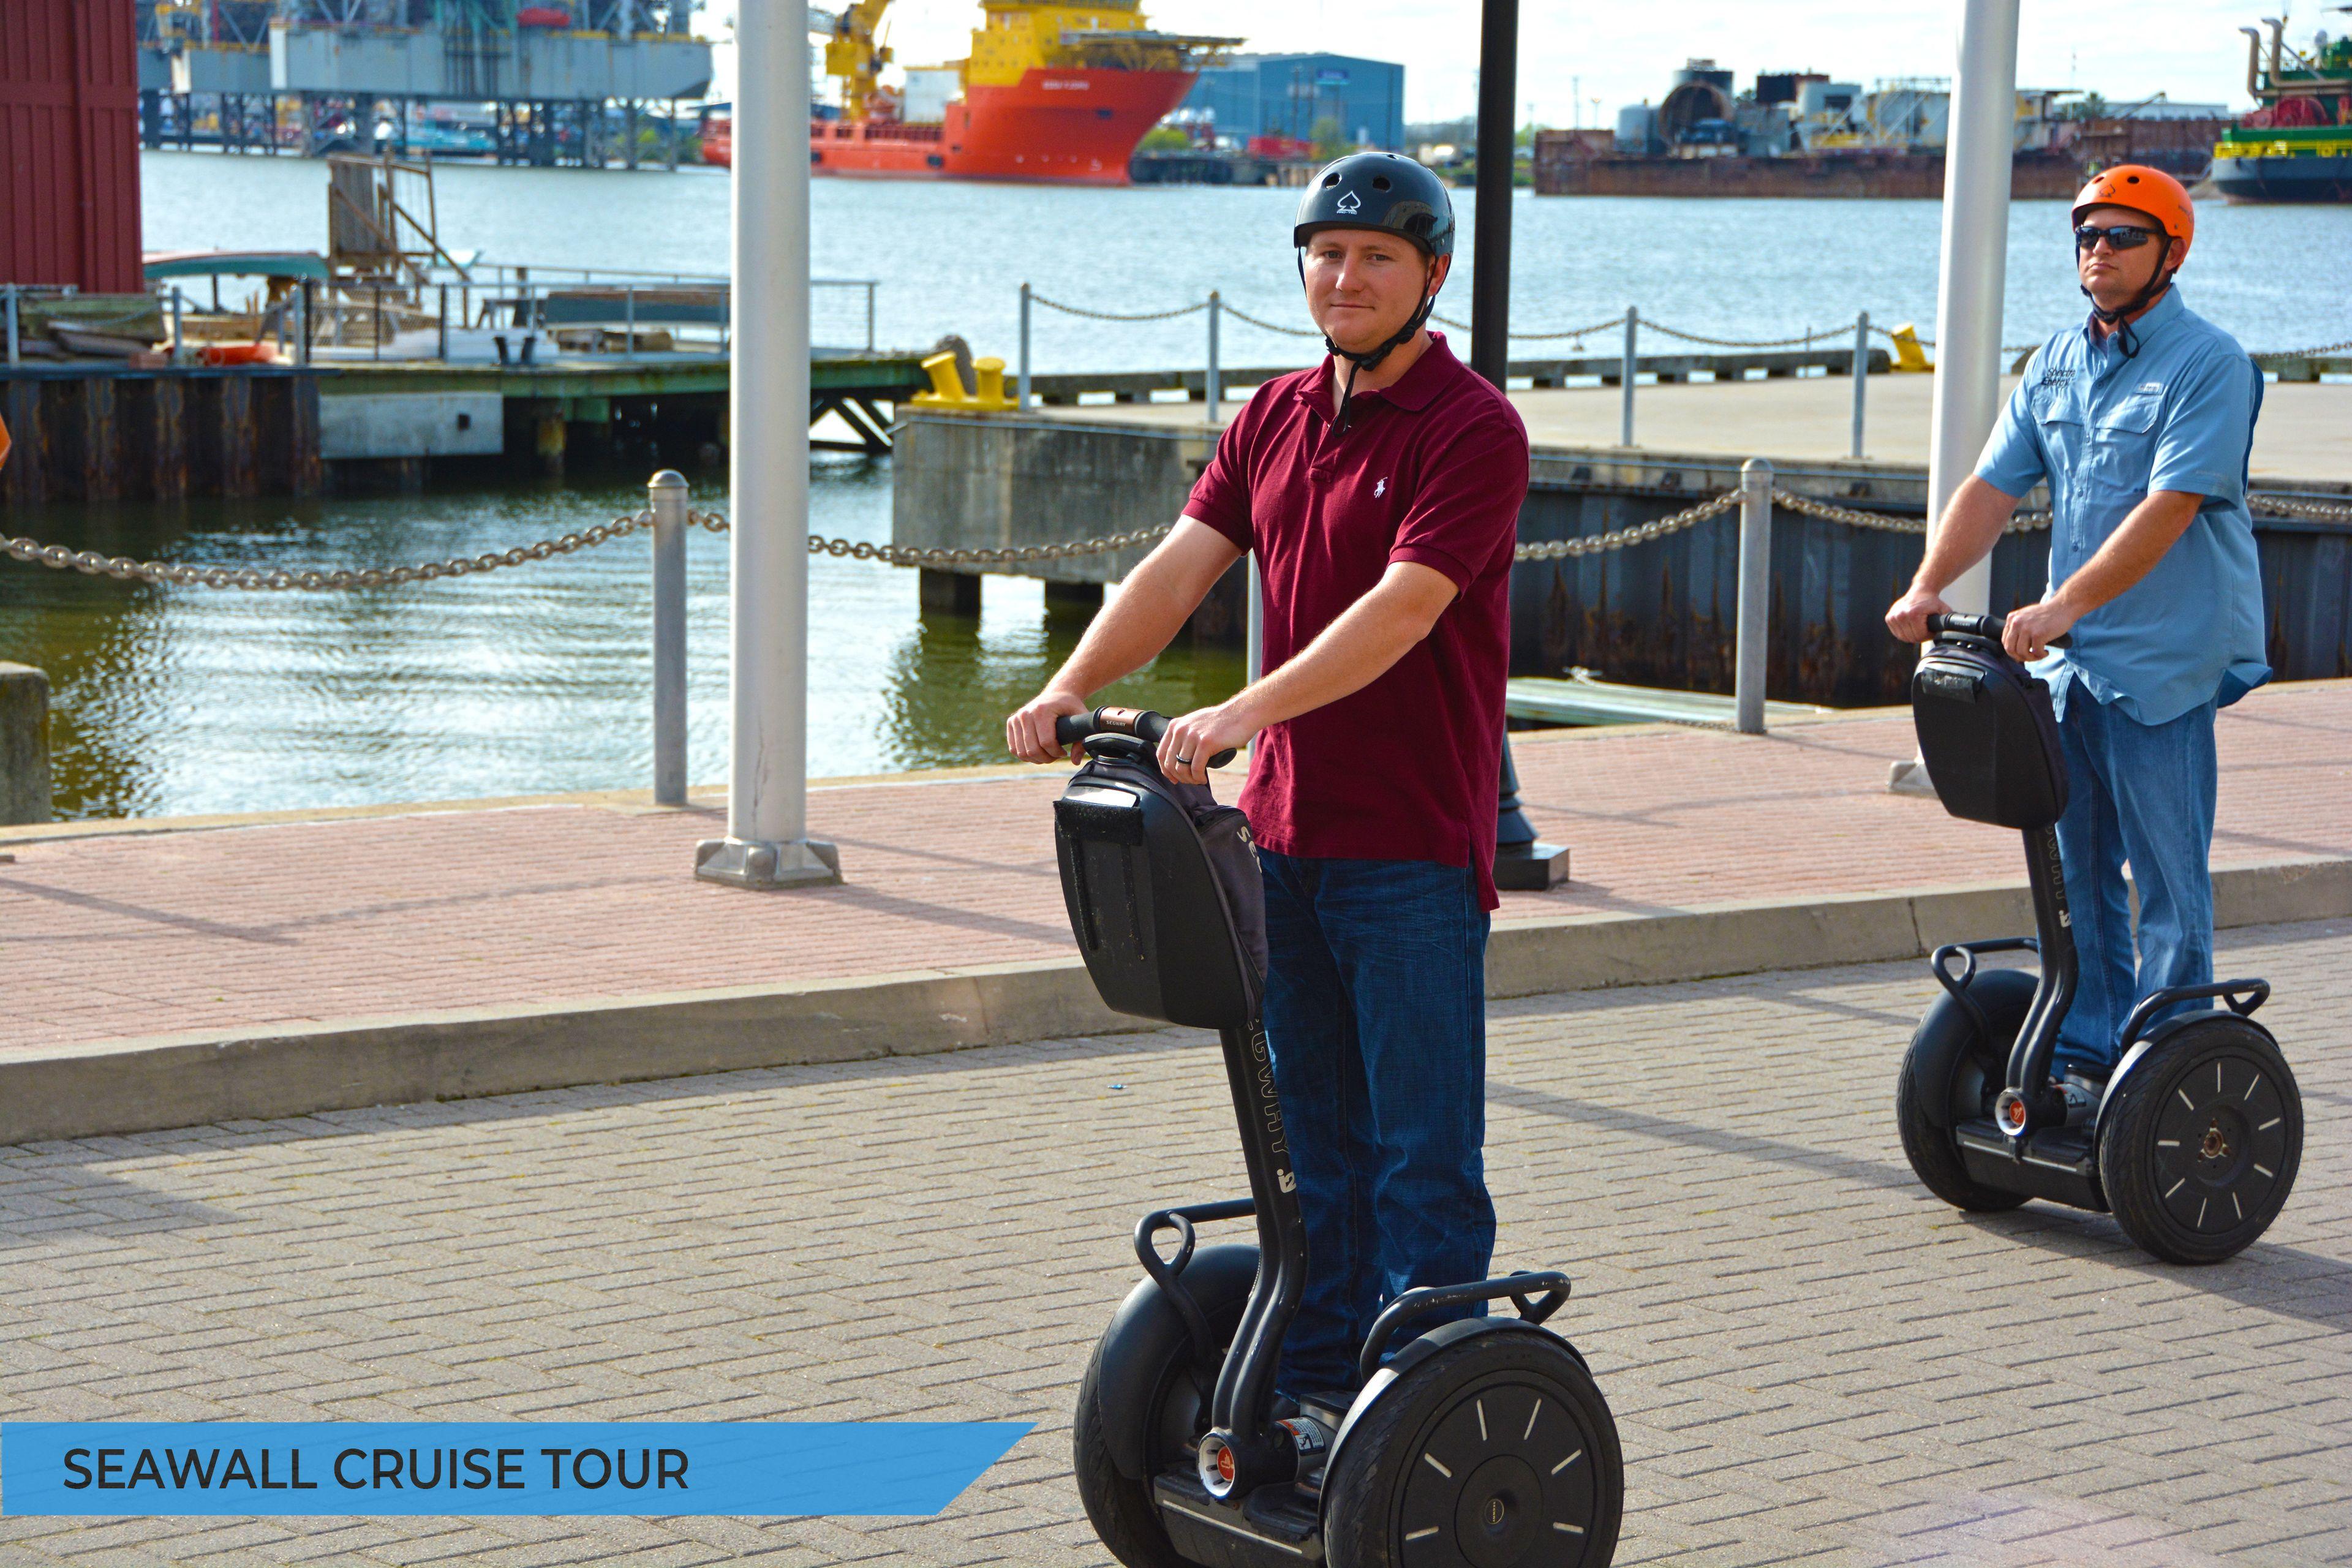 Segway Galveston Seawall Cruise Tour